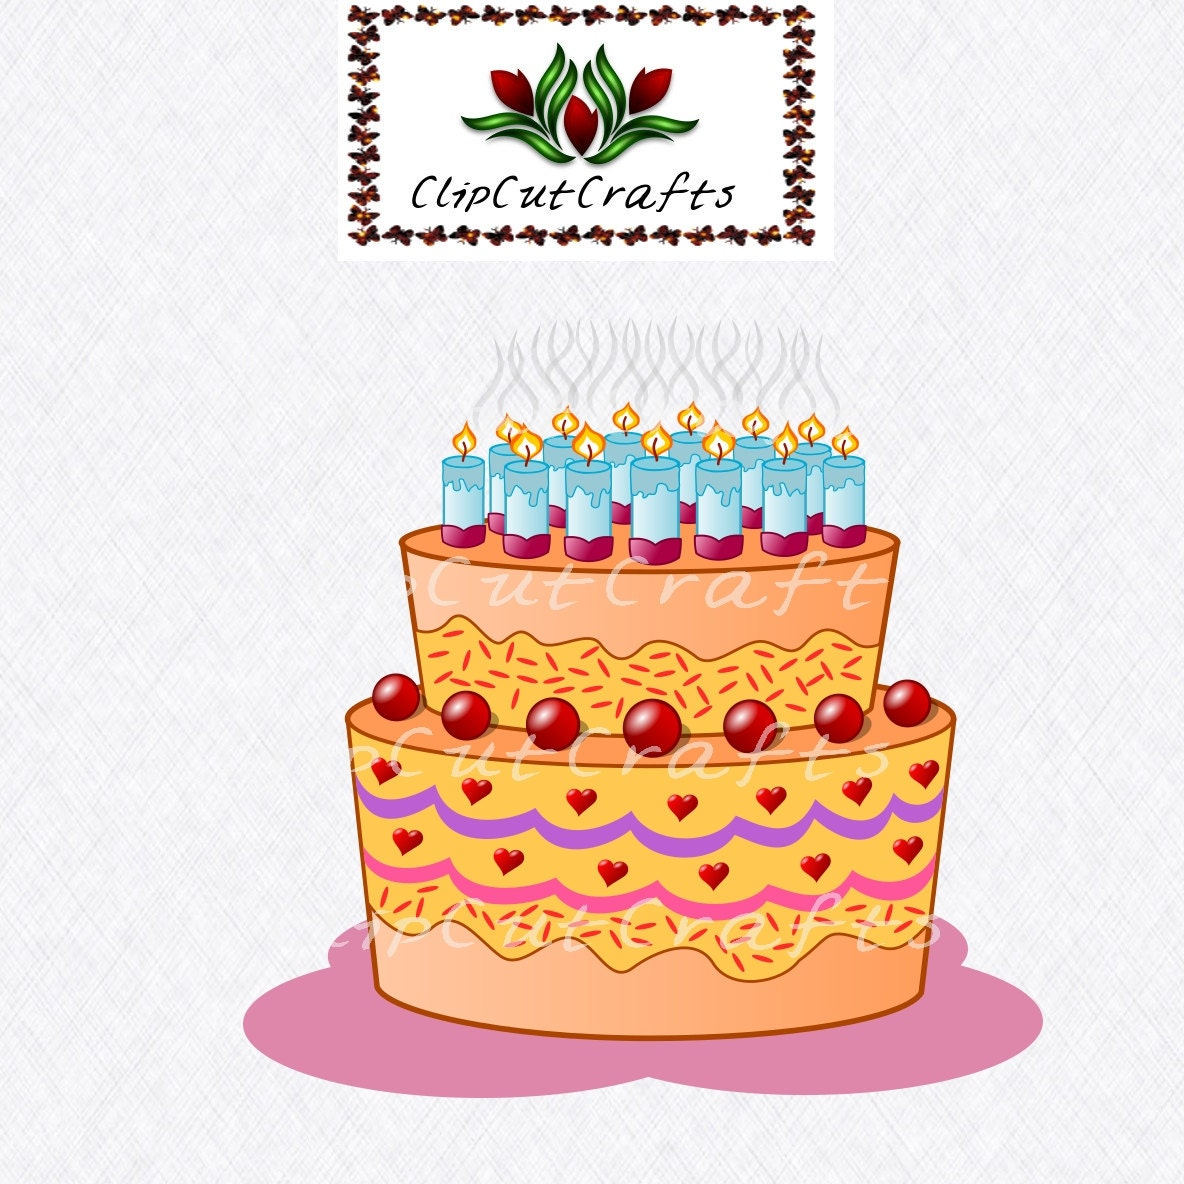 Happy Birthday Cake Design Art Cut File Print And Cut Paper Craft